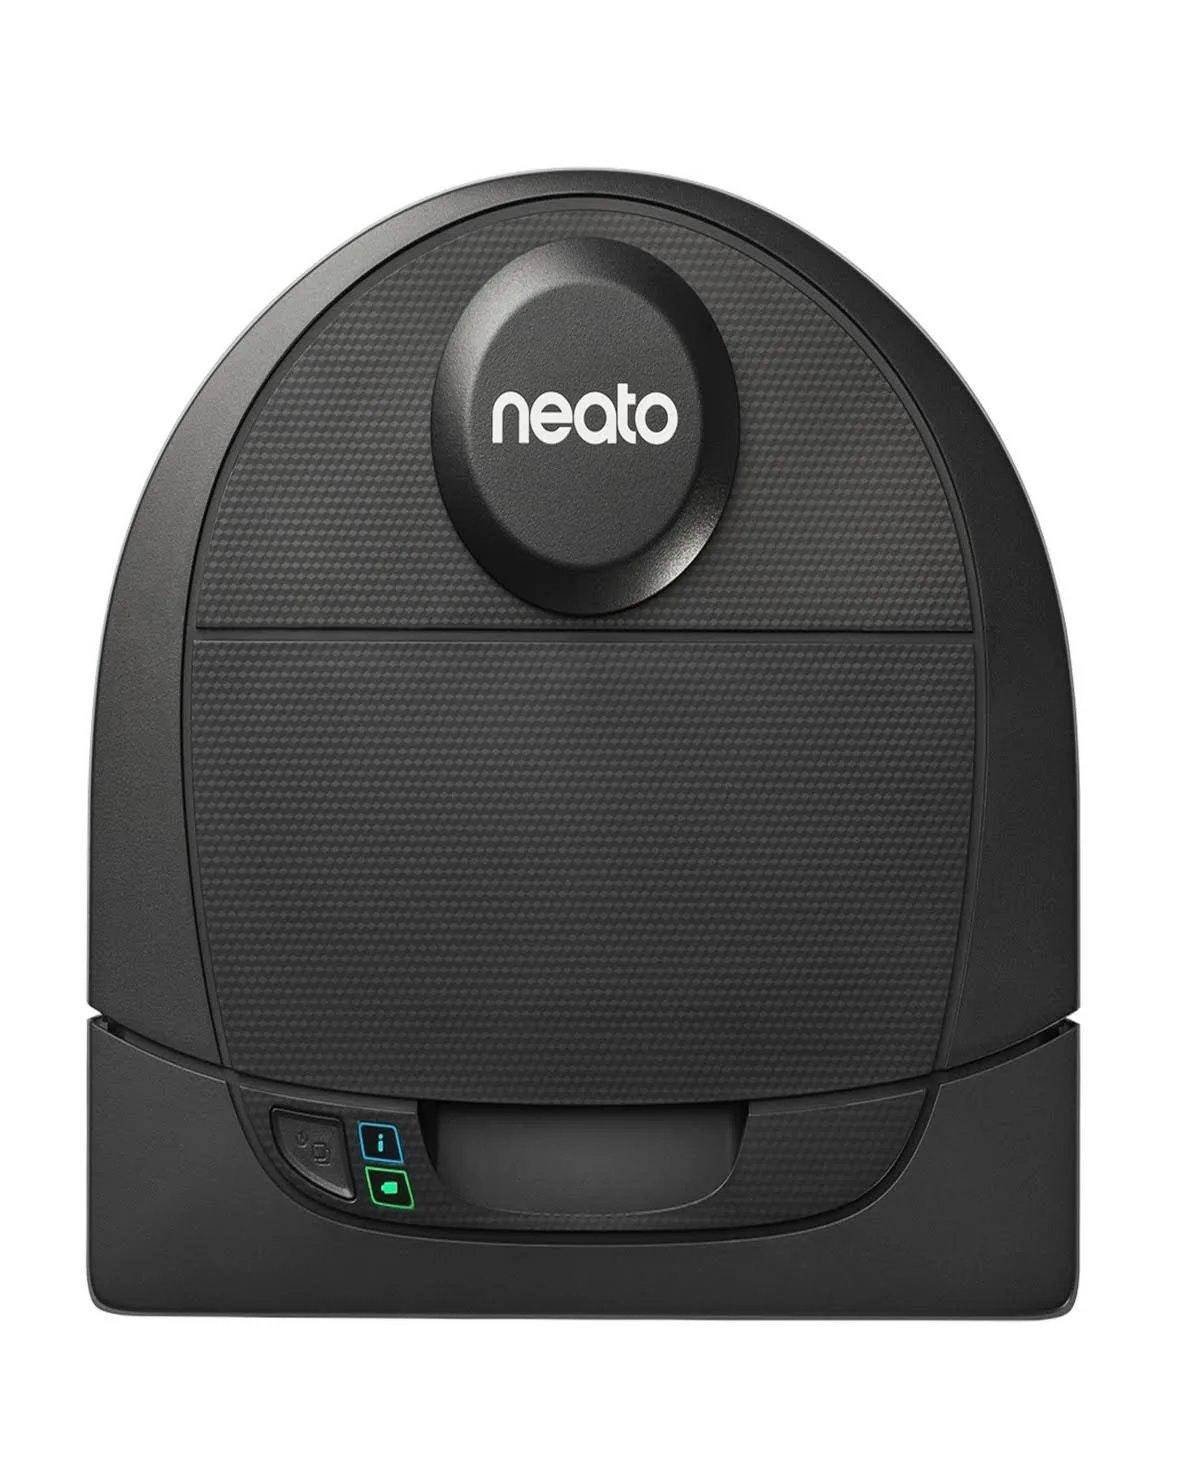 Neato Robotics D4 Laser Guided Smart Robot Vacuum